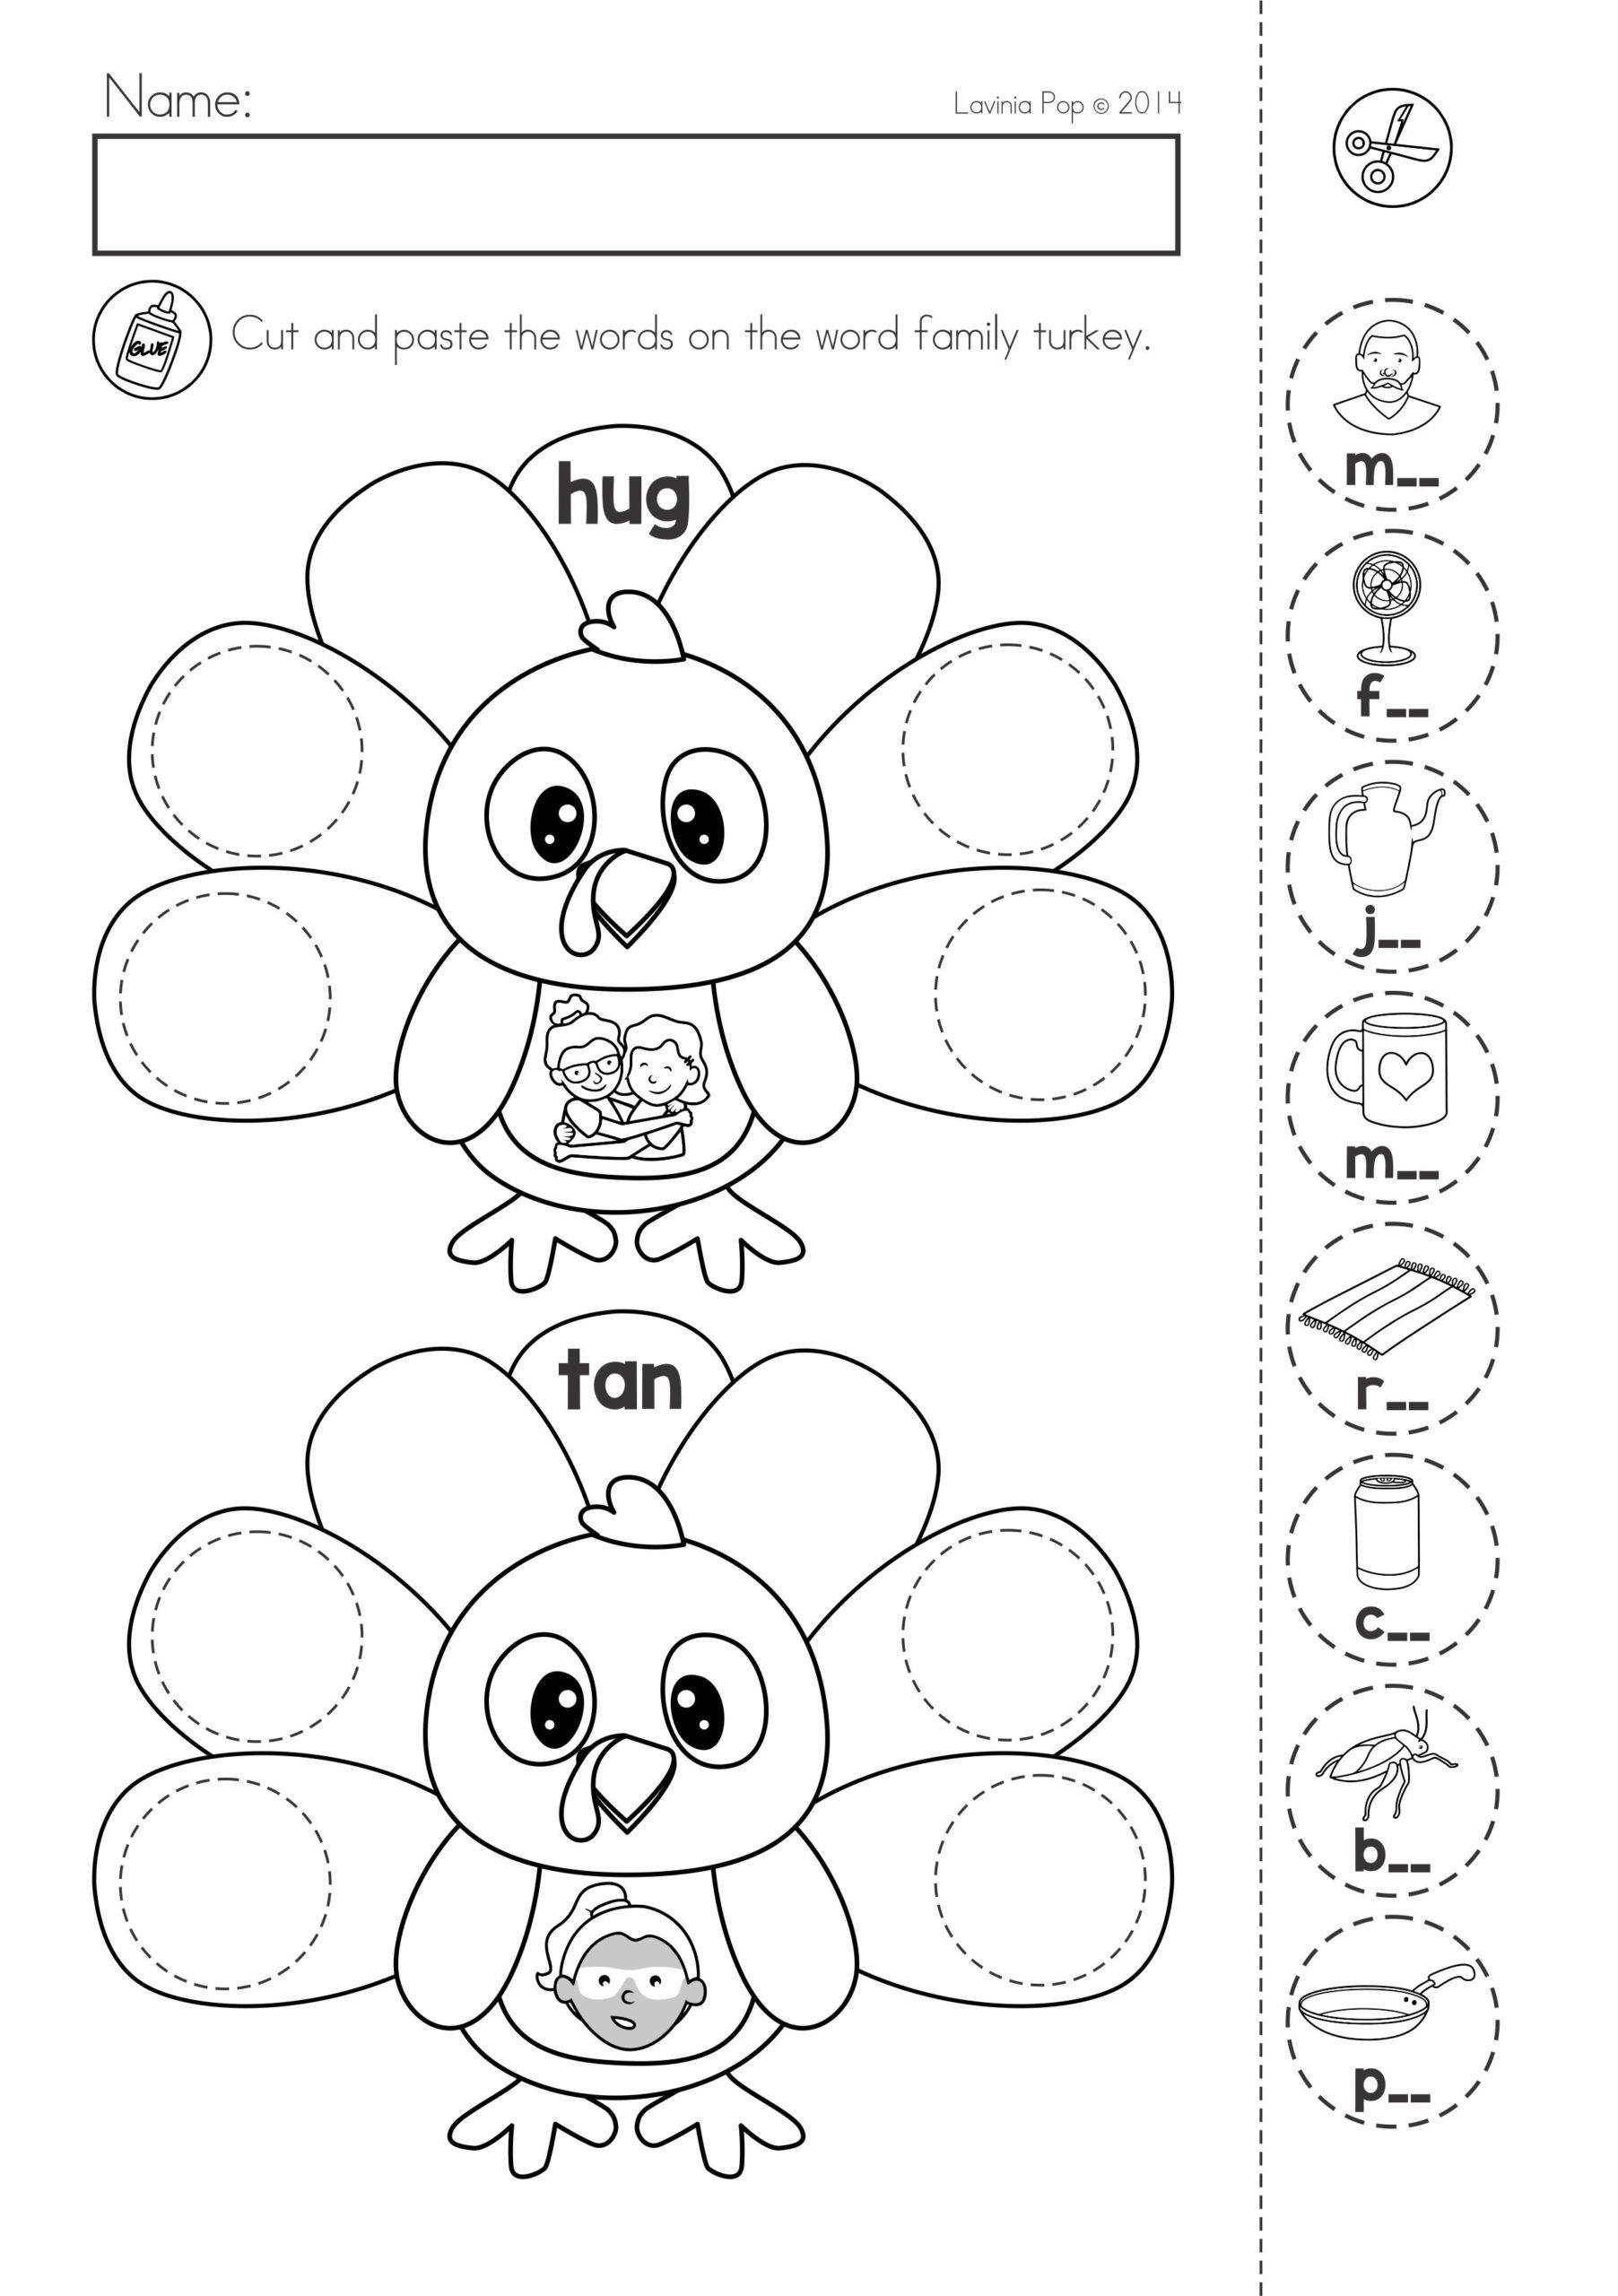 Bar Models Worksheets 2nd Grade Math Coloring Worksheets Thanksgiving Math Worksheets Halloween Worksheets [ 2560 x 1804 Pixel ]